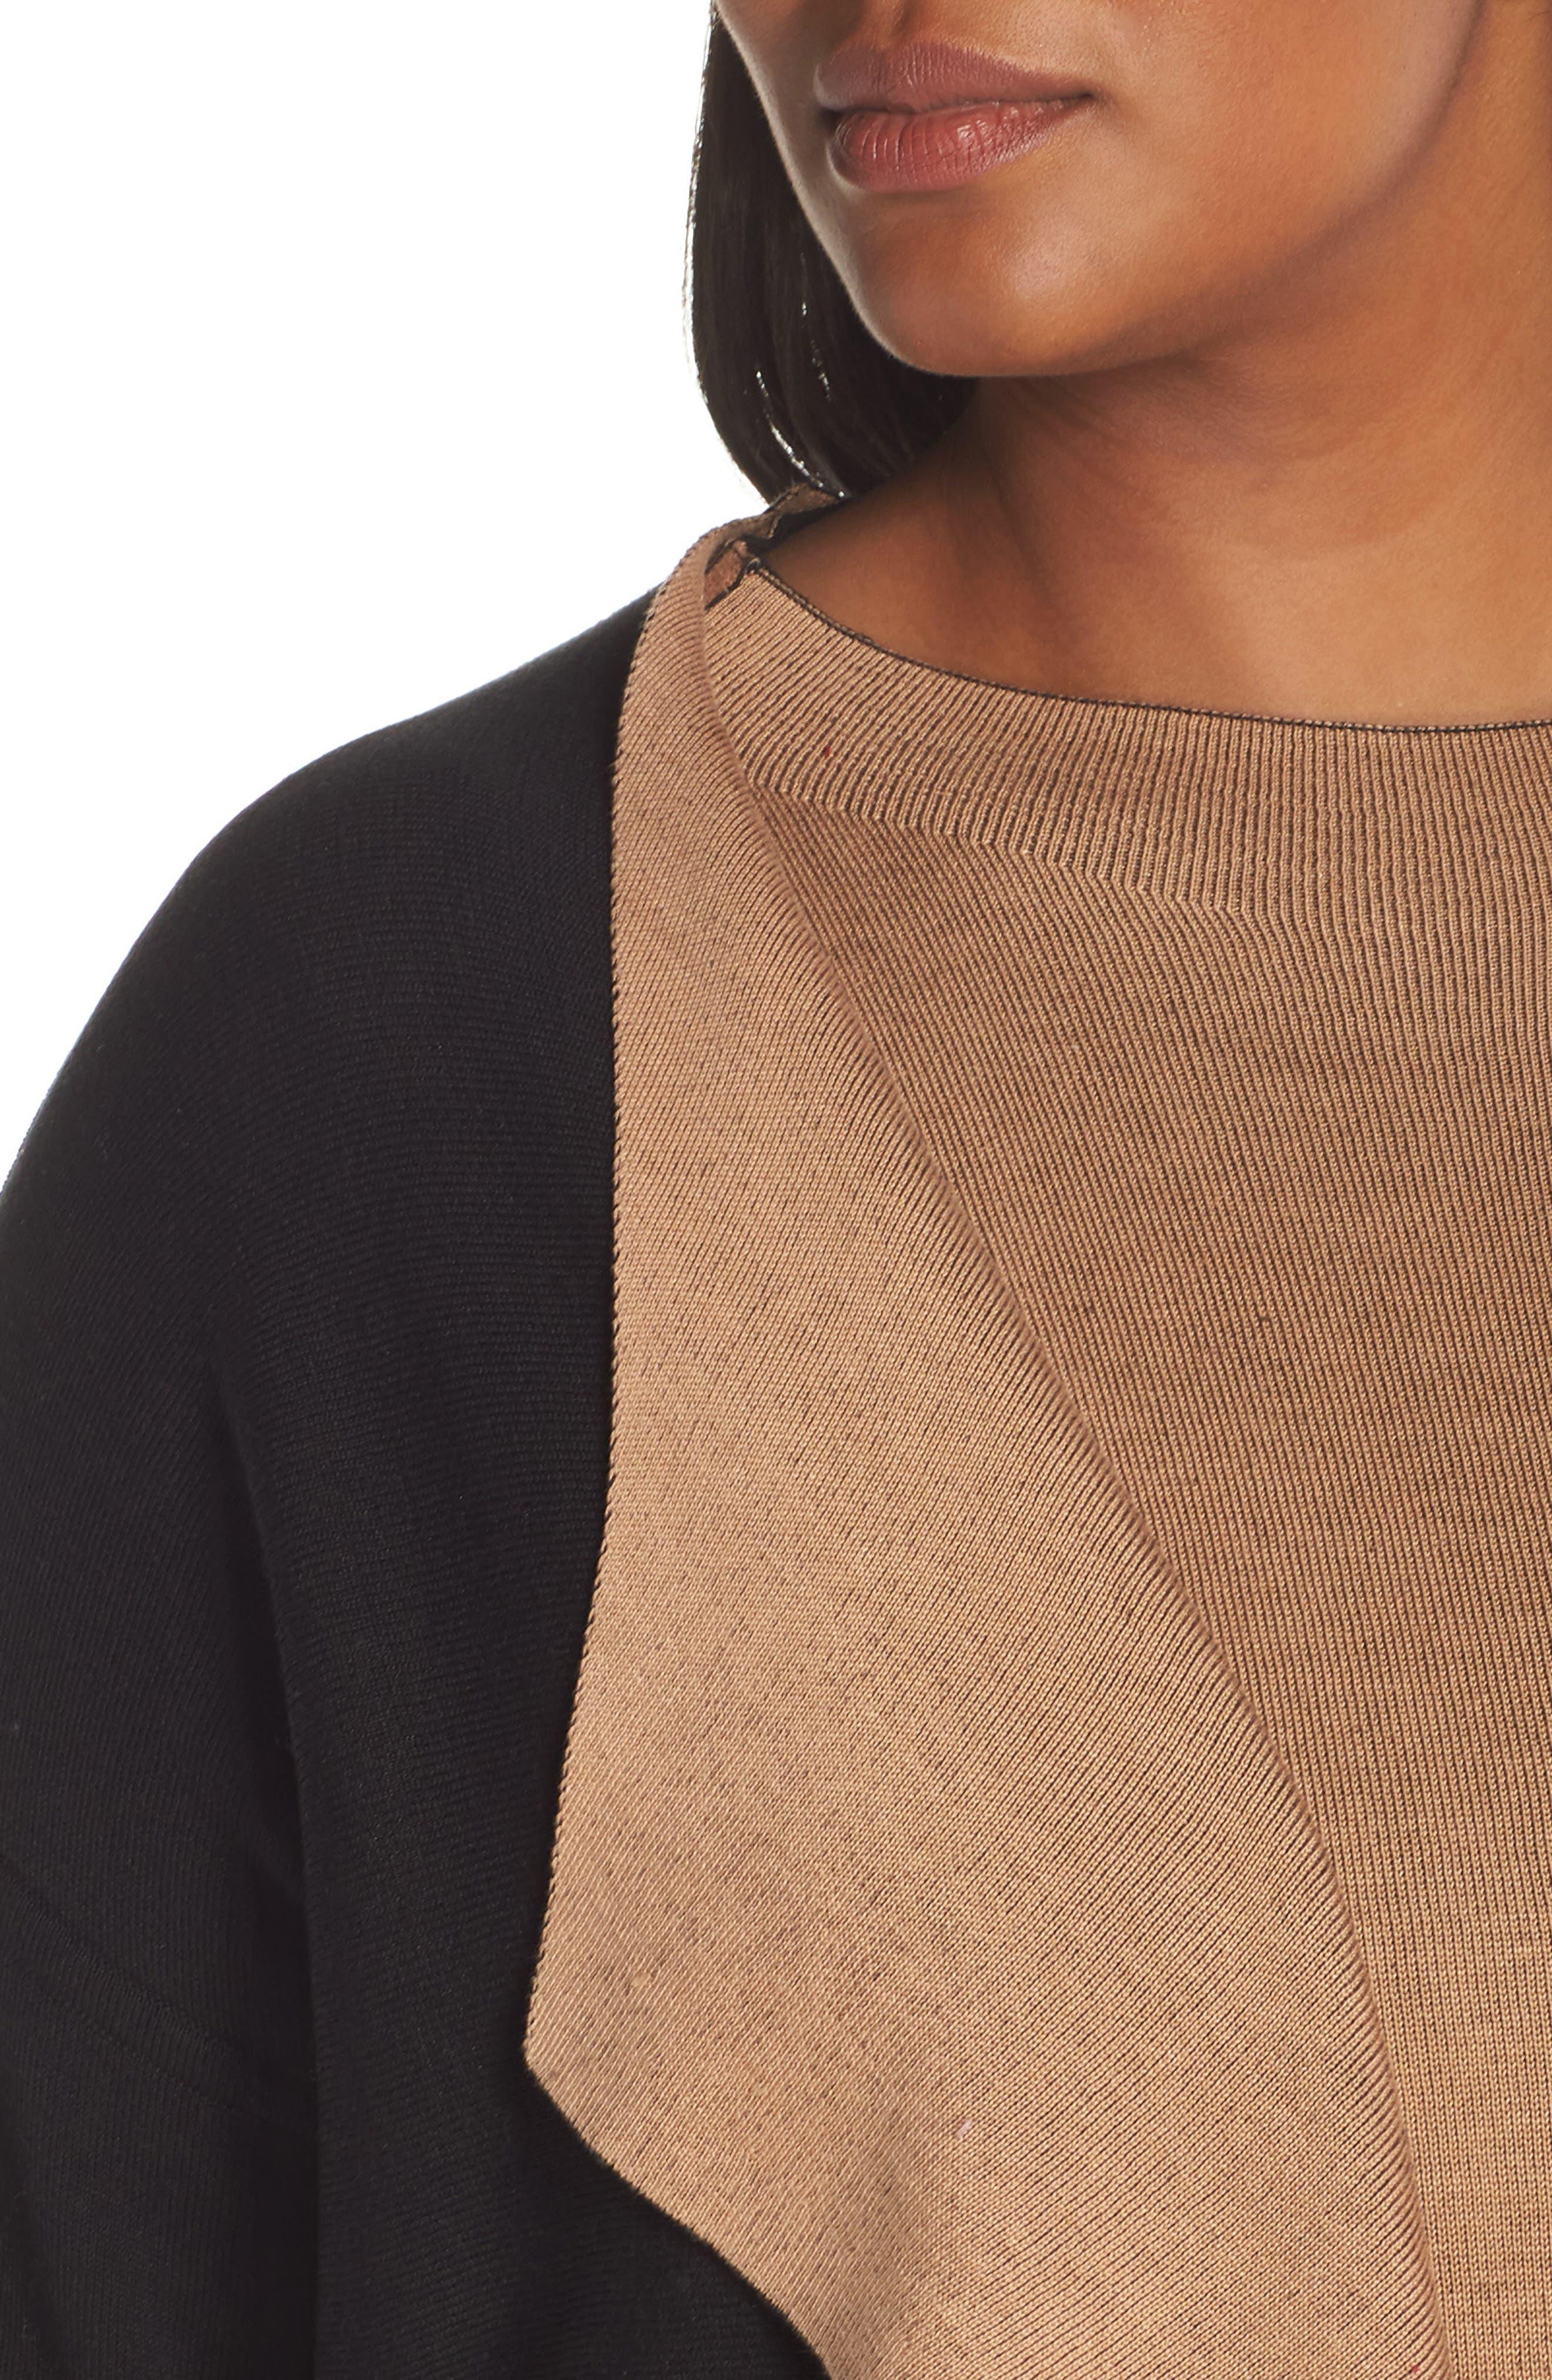 Reversible Silk Blend Cardigan,                             Alternate thumbnail 11, color,                             BLACK/ CLAY